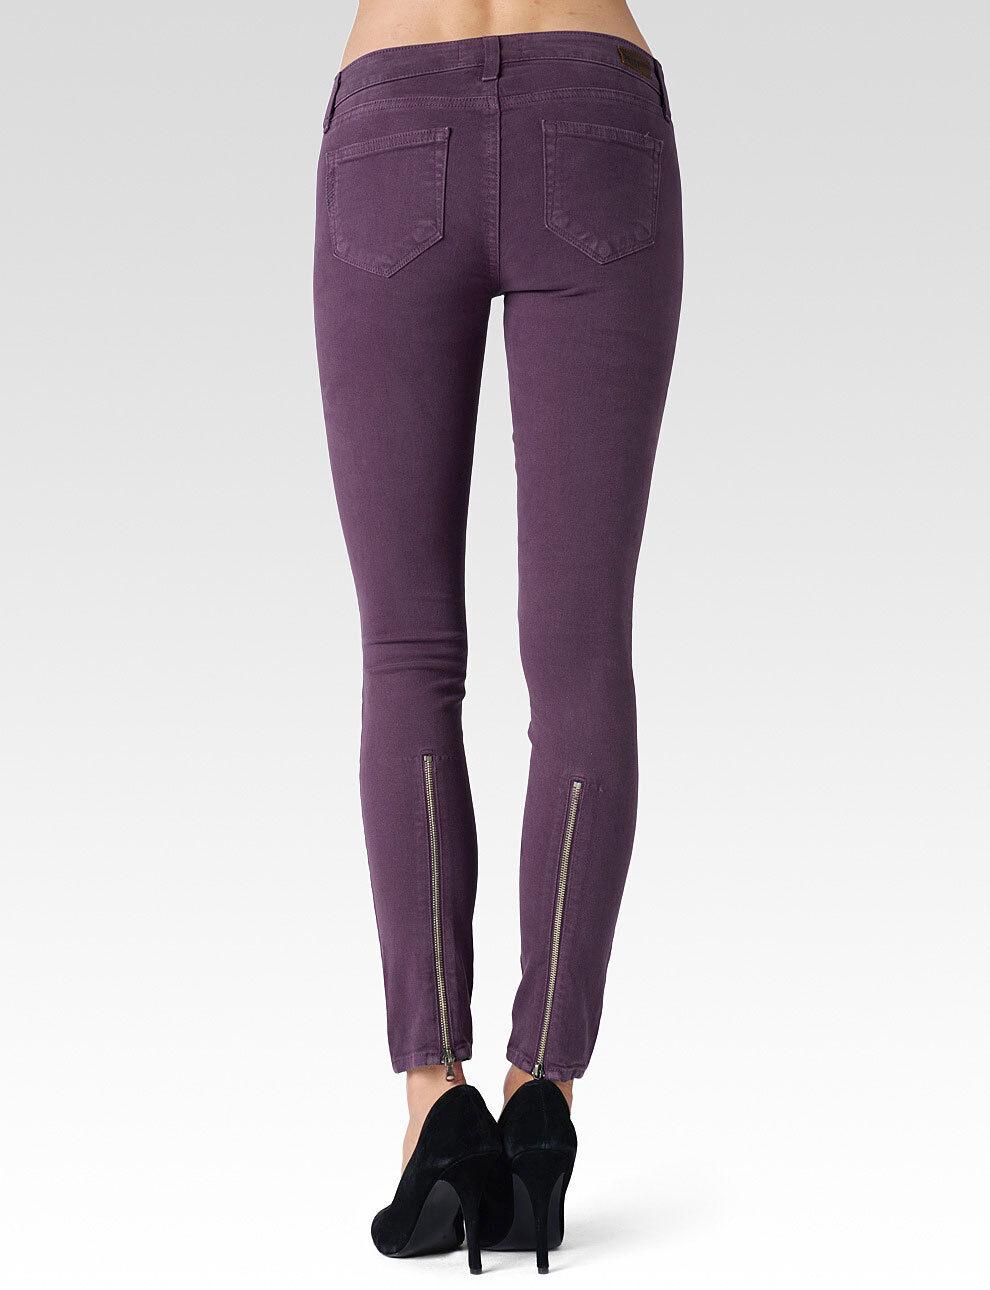 Nwt Paige Jeans Sz24 Sienna Reißverschluss Midrise Ultra Skinny-Stretch Narnia